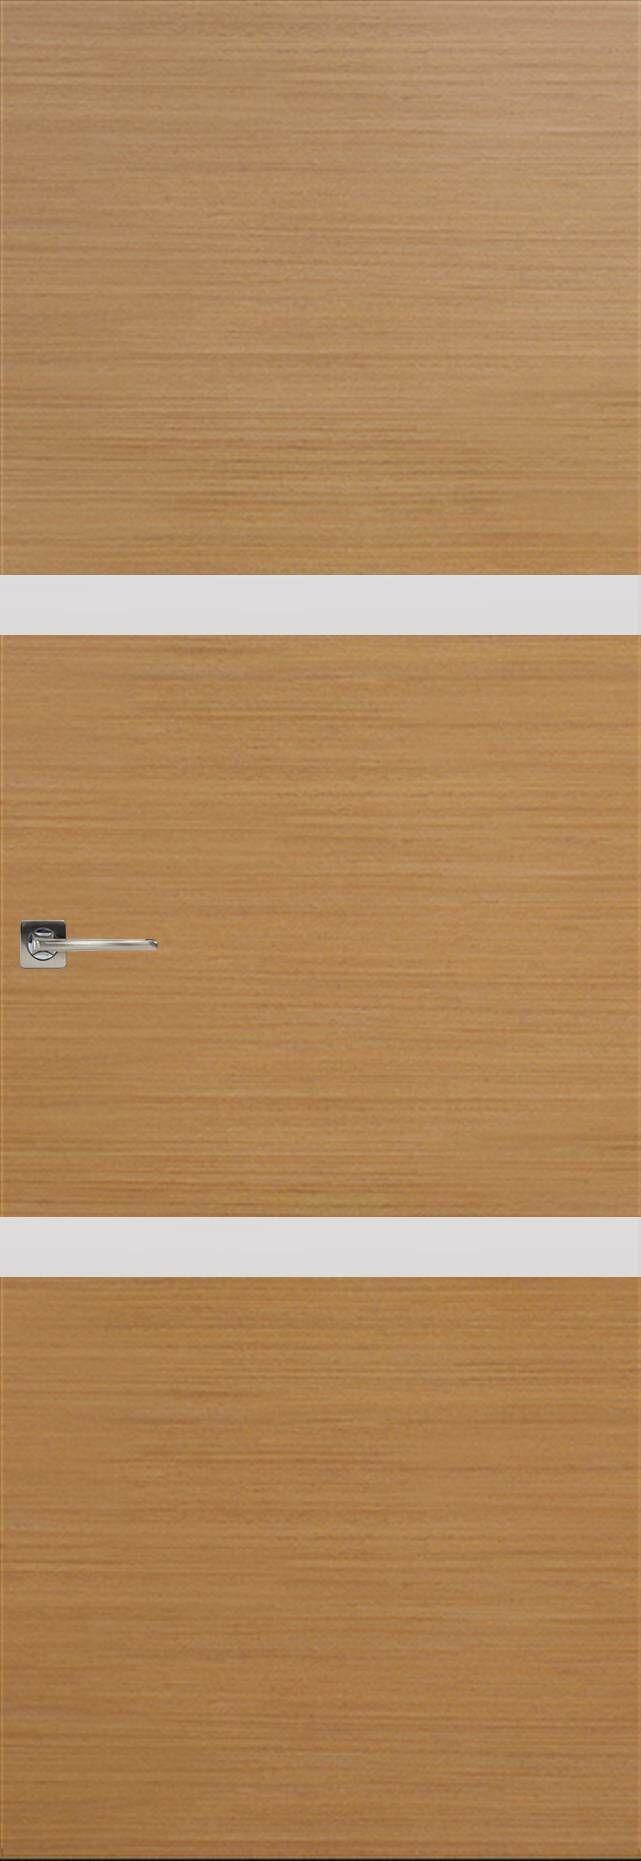 Tivoli В-4 Invisible цвет - Миланский орех Без стекла (ДГ)